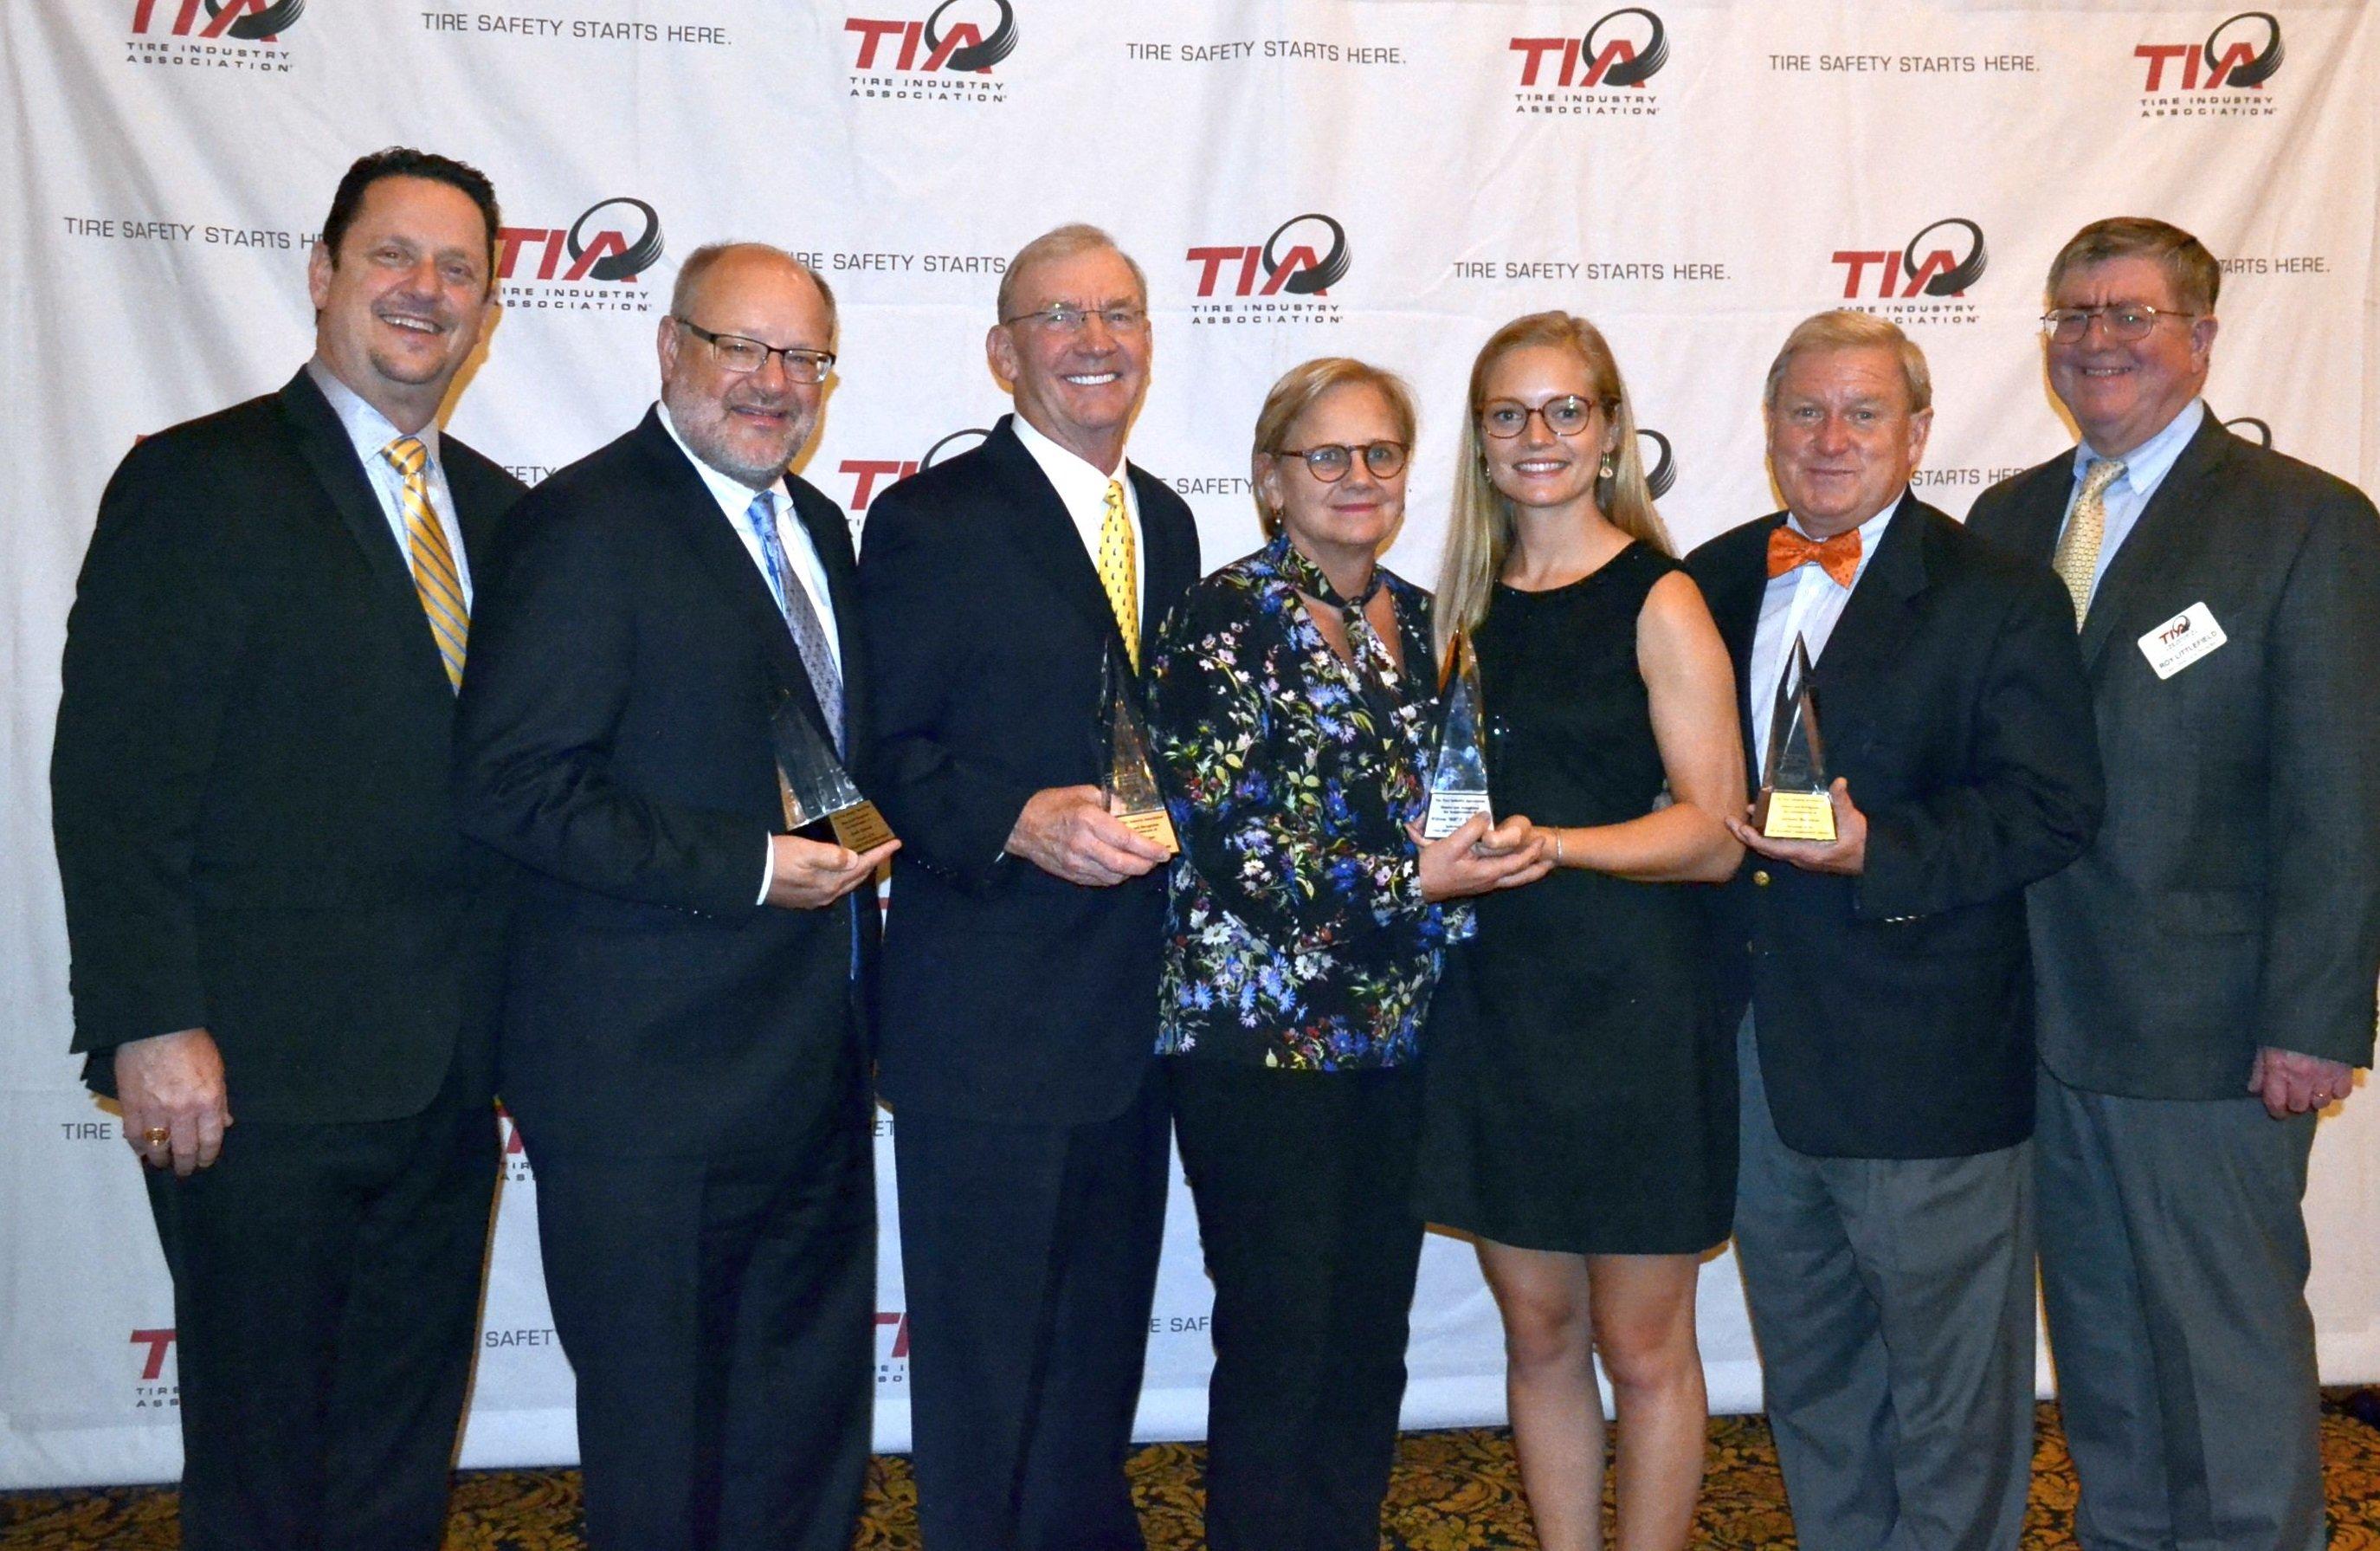 Photos: TIA Celebrates at the 2017 SEMA Show